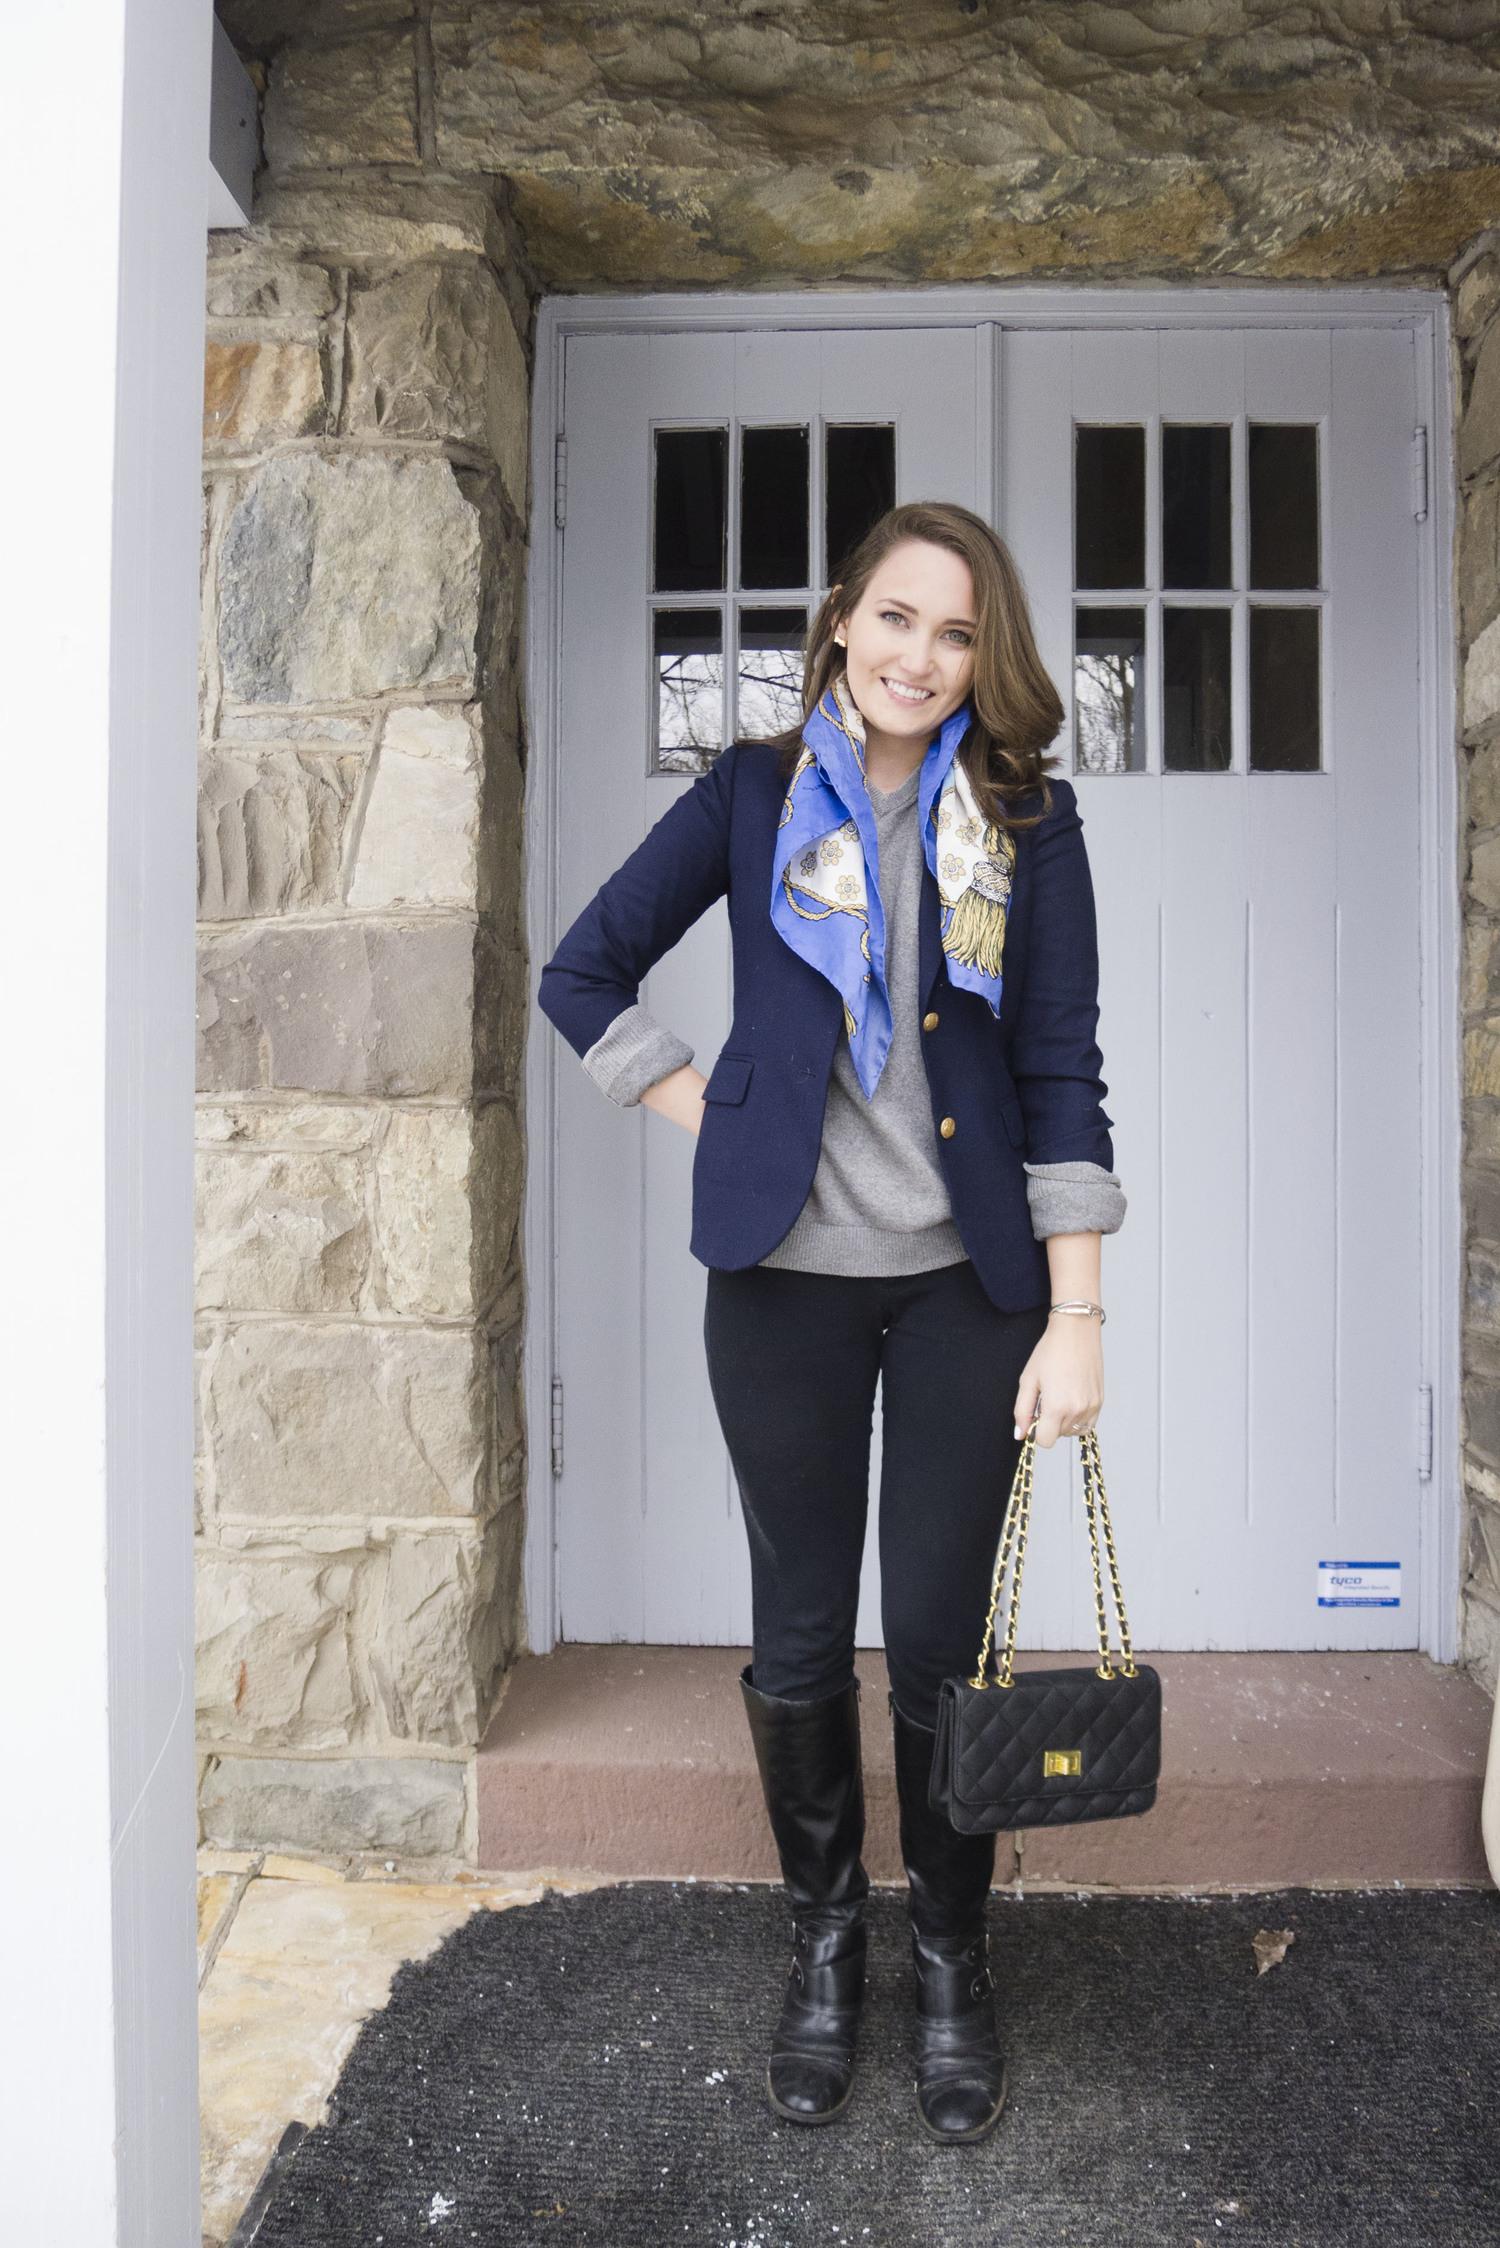 7a51f58a57 Outfit Post  The Blue Blazer — OhCarlene